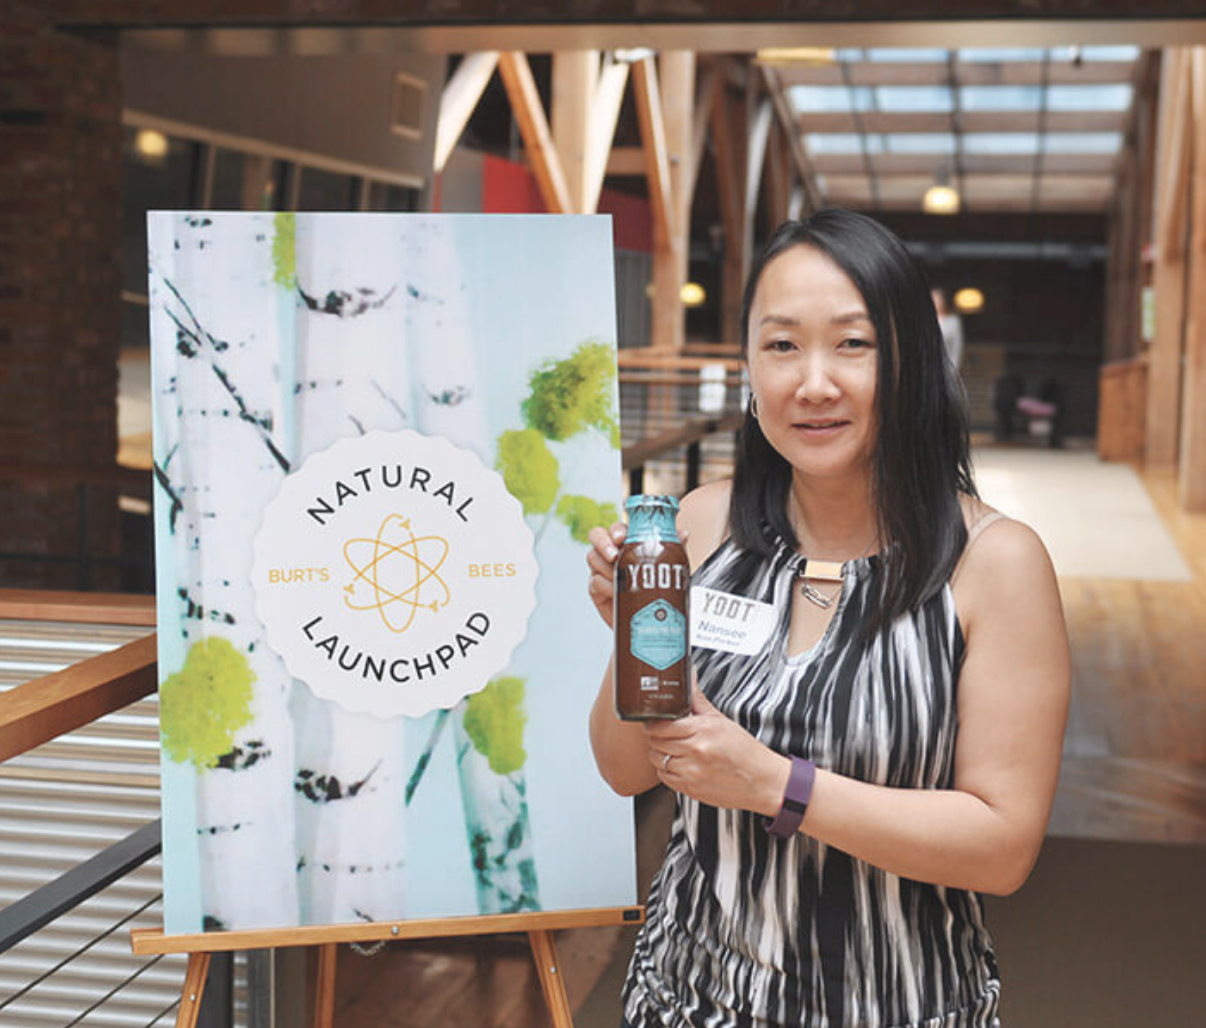 Nansee winning Burt's Bees Natural Launch Pad award for her YOOT Chai Dandelion Tea.